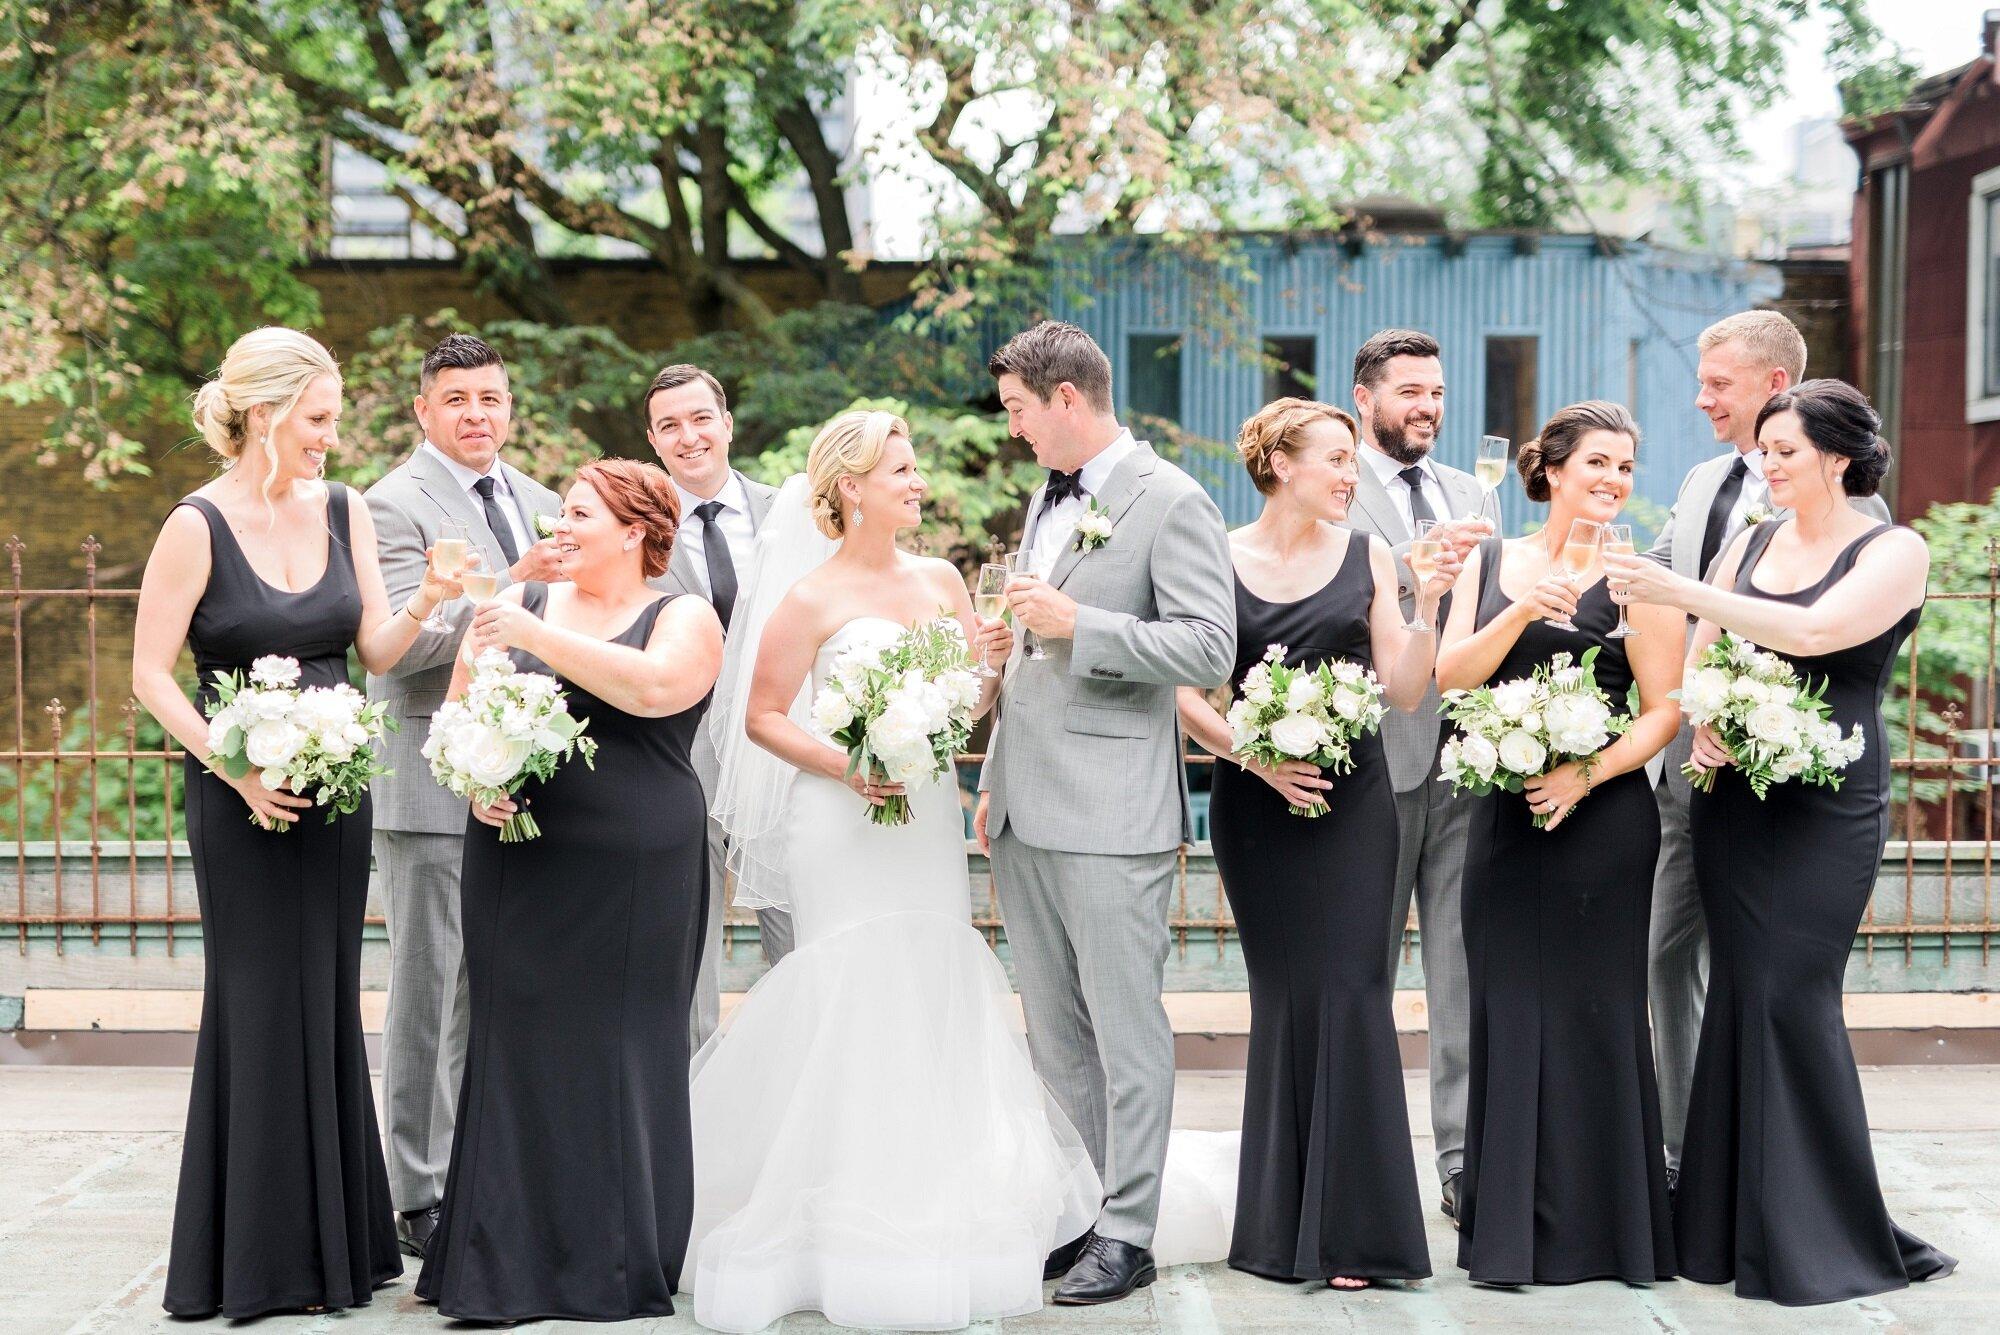 berkeley-field-house-wedding-kj-and-co-11.jpg